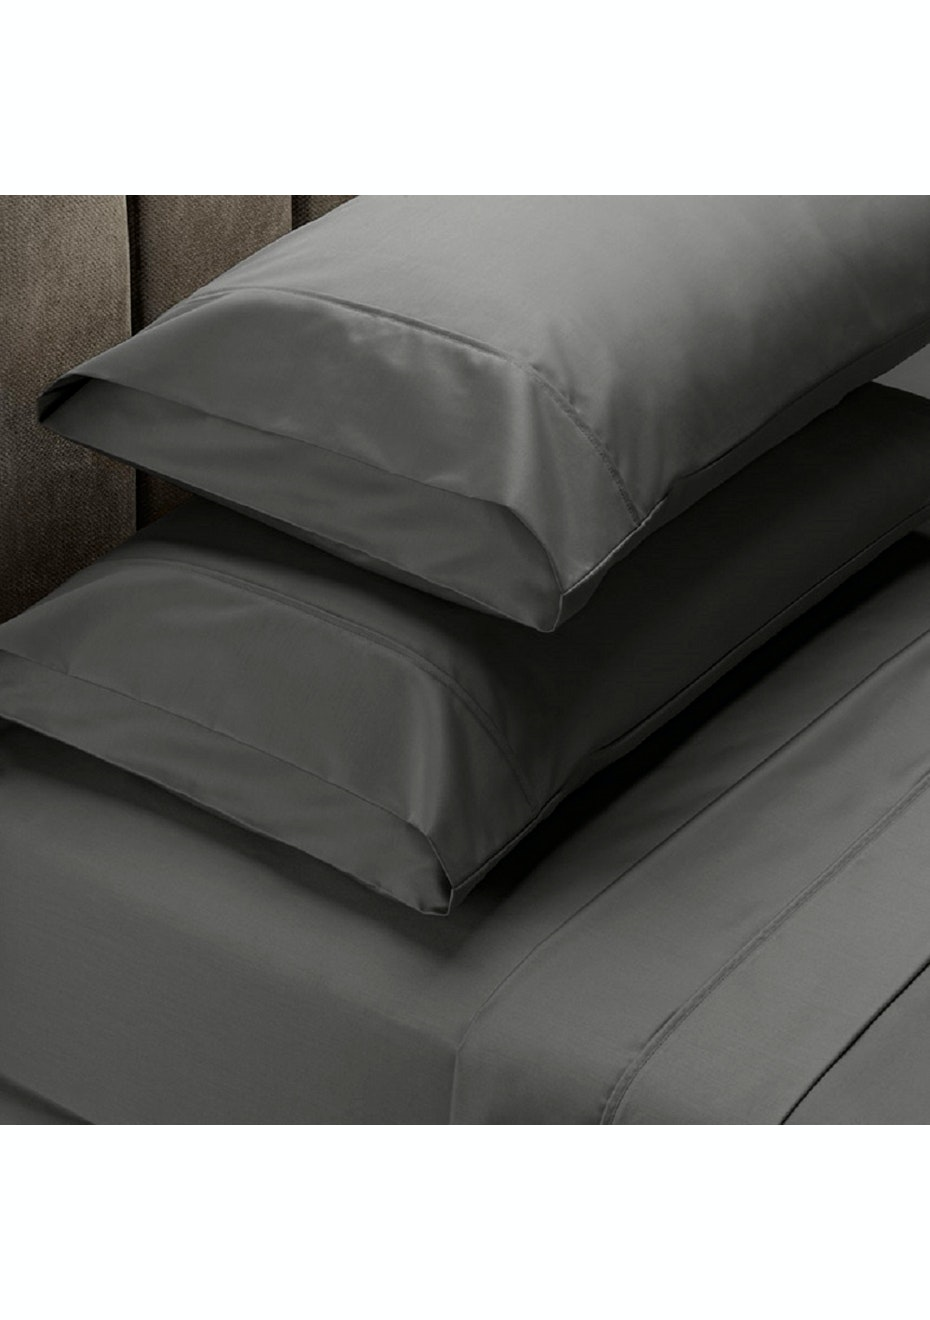 Park Avenue 1000 Thread Count 100% Egyptian Cotton Sheet Sets Mega Queen - Granite